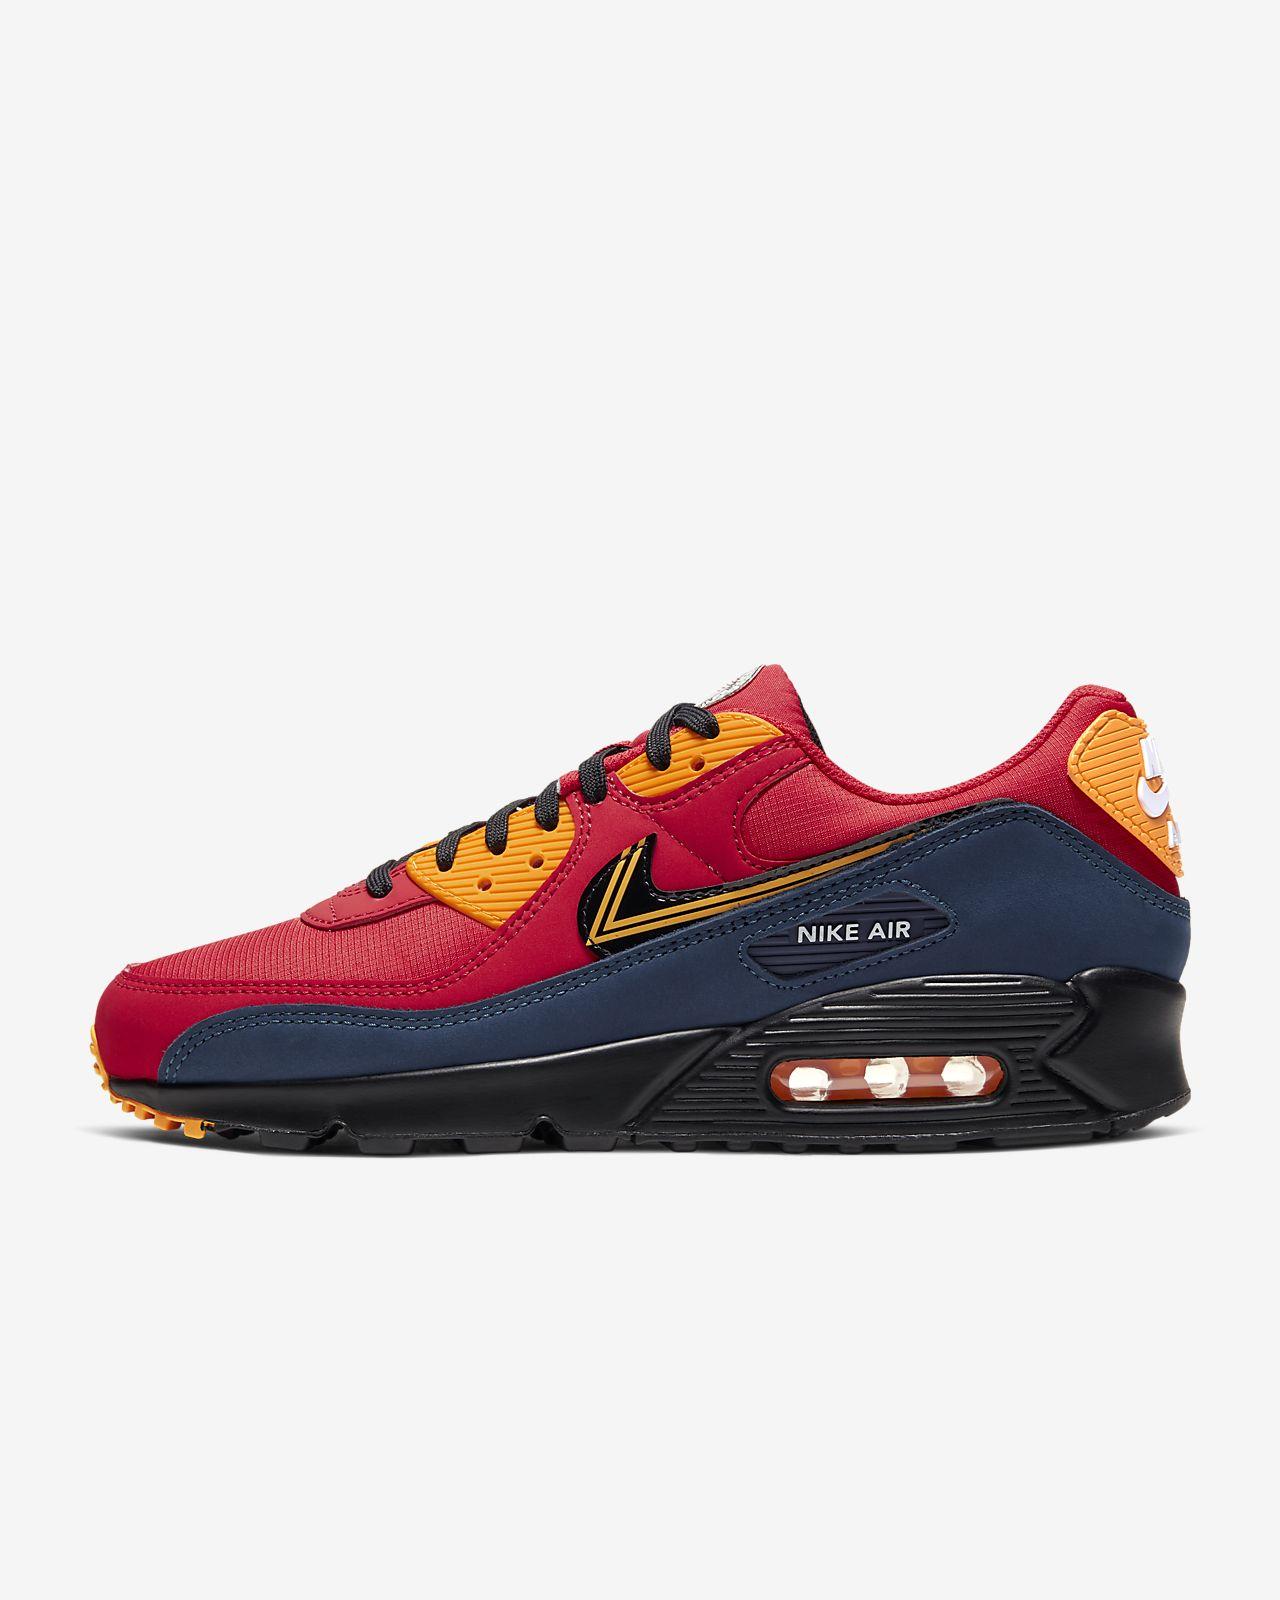 Nike Air Max 90 Premium Schoen